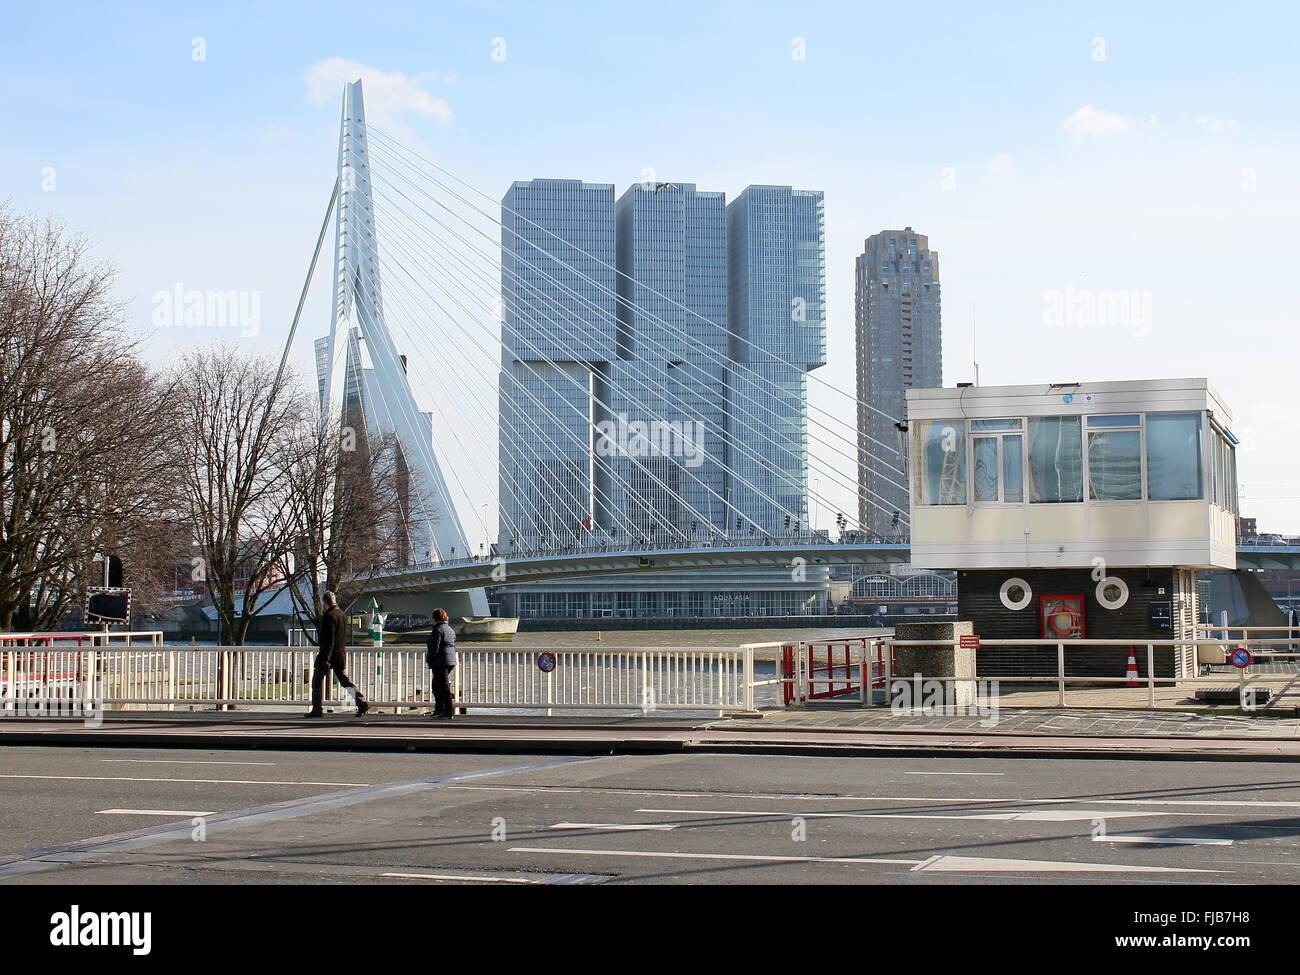 Nieuwe Leuvebrug, Rotterdam. Behind it the Erasmus bridge. In background 'De Rotterdam' skyscraper complex - Stock Image